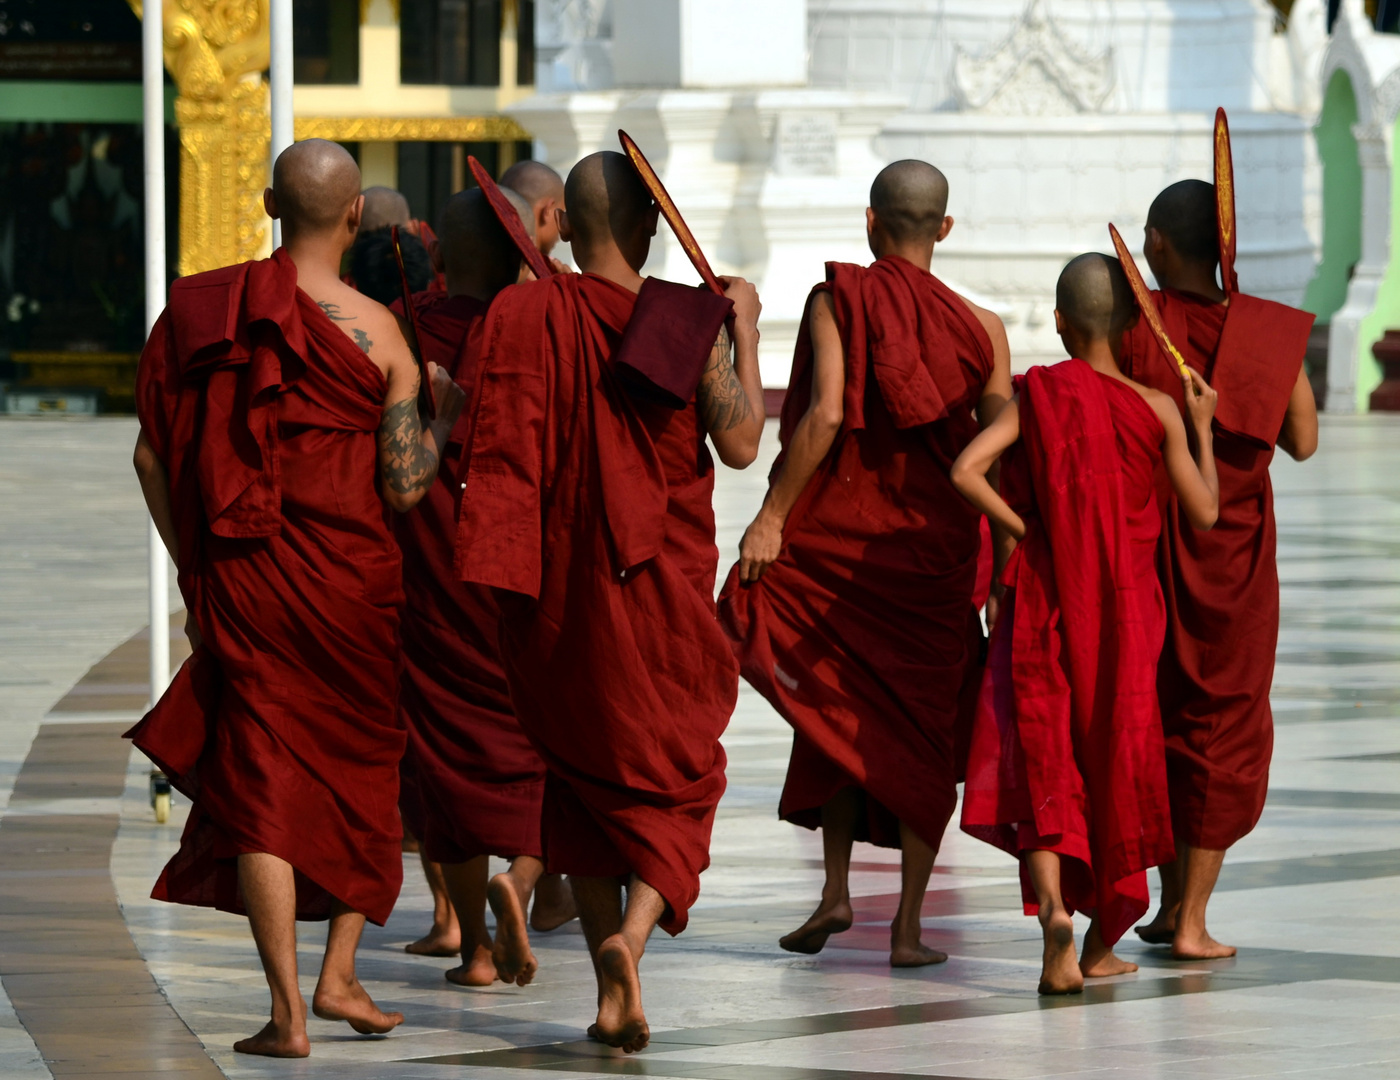 Mönchsgruppe